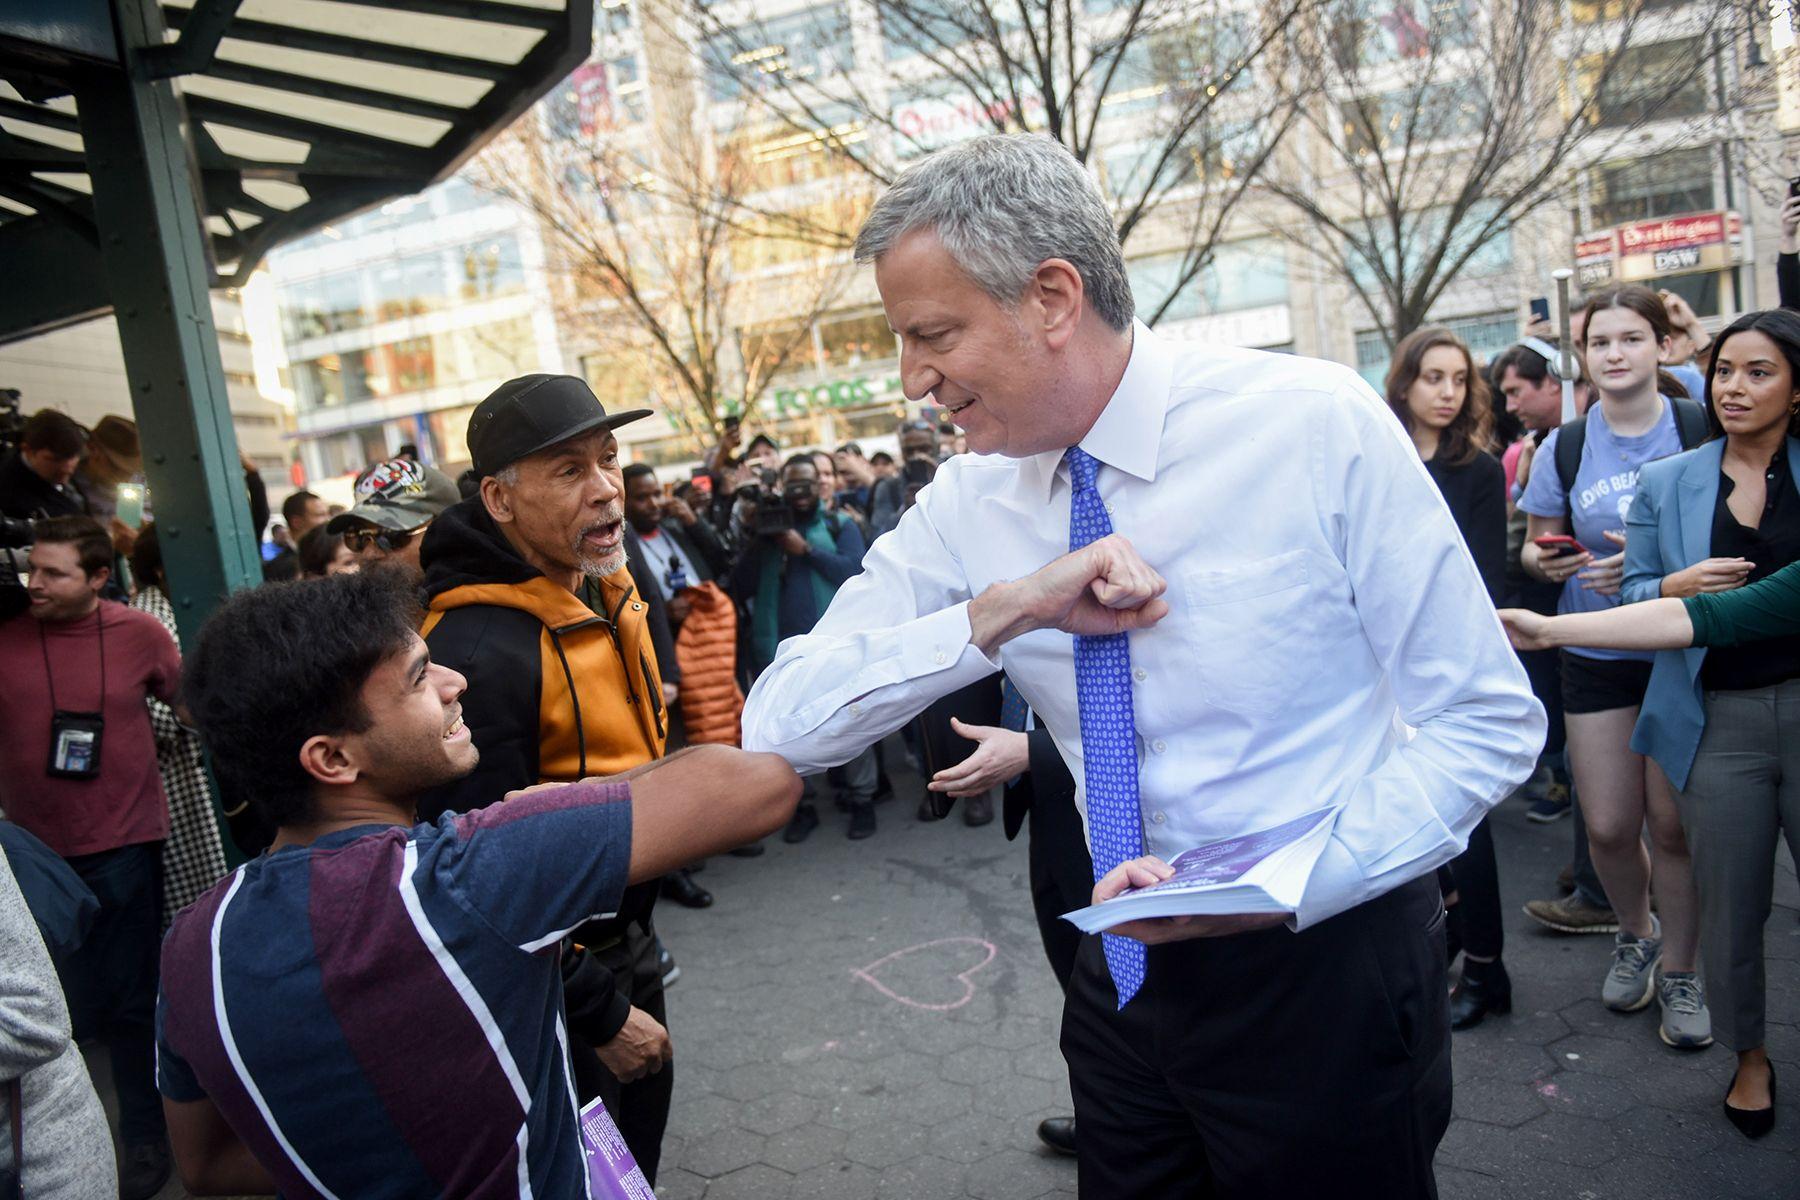 Mayor Bill de Blasio hands out fliers regarding coronavirus preparedness in Union Square on Monday, March 9, 2020.